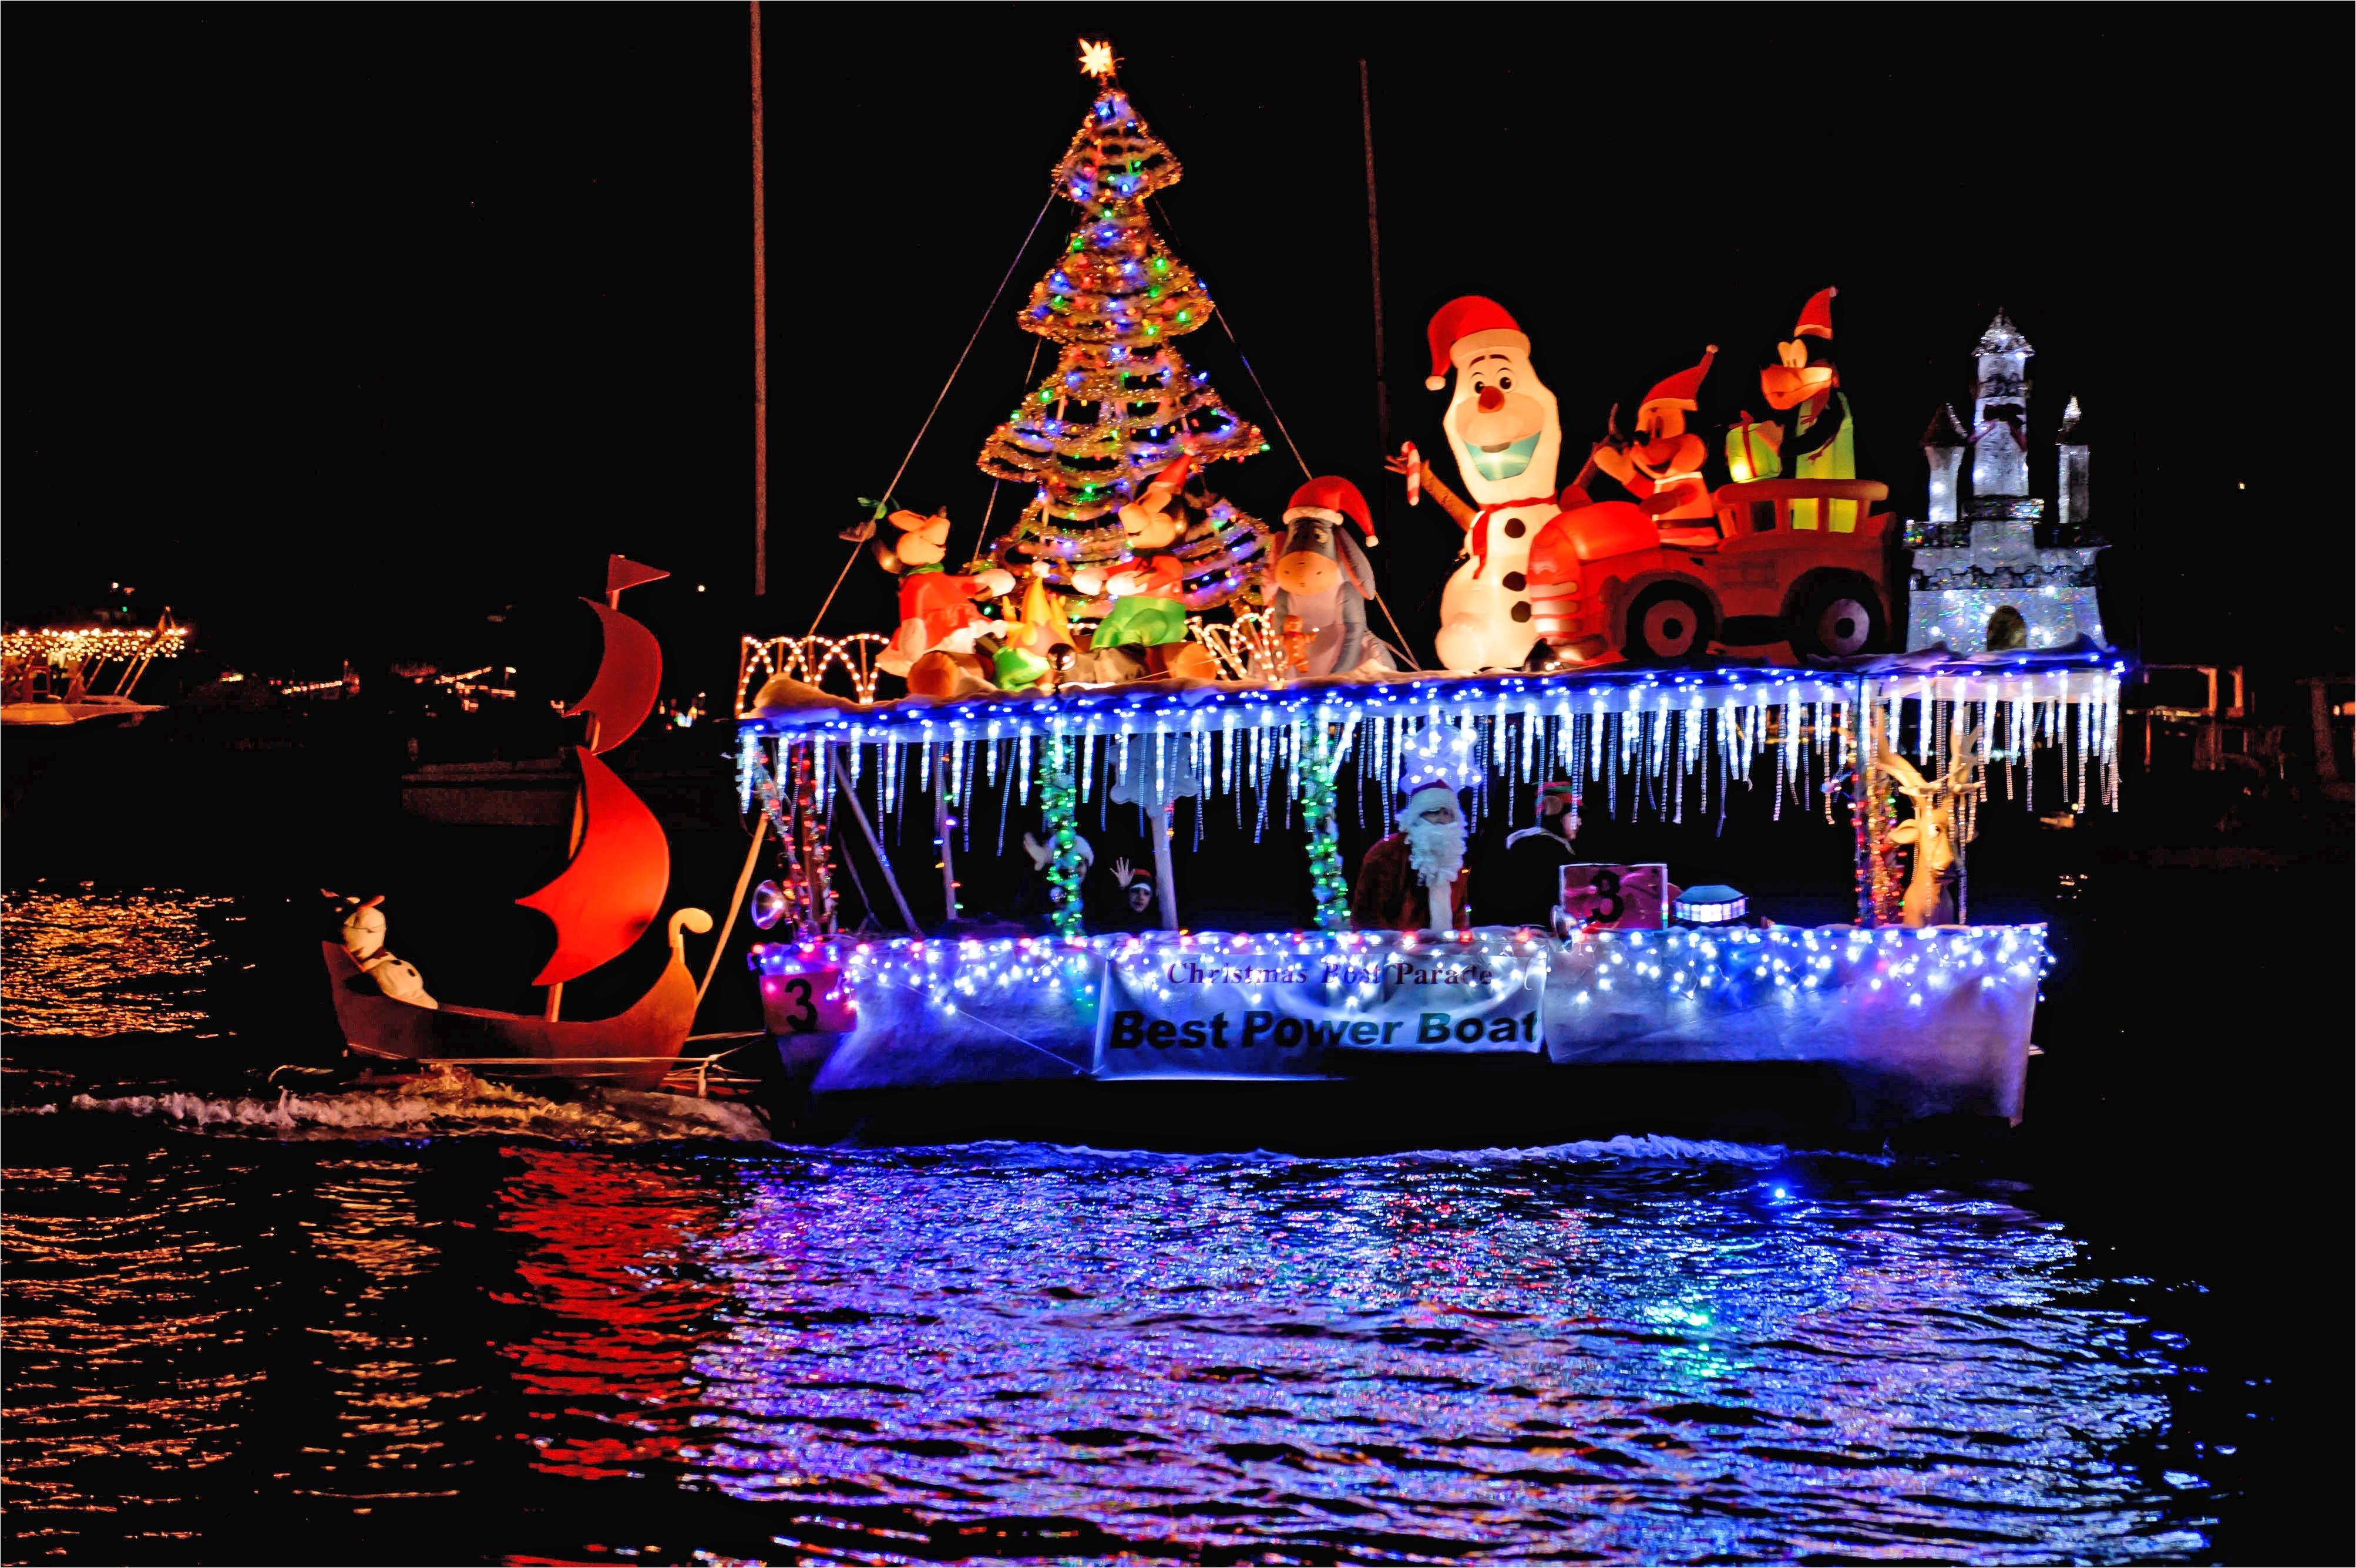 Newport Beach Christmas Lights Cruise.Newport Beach Christmas Lights Cruise Bradshomefurnishings